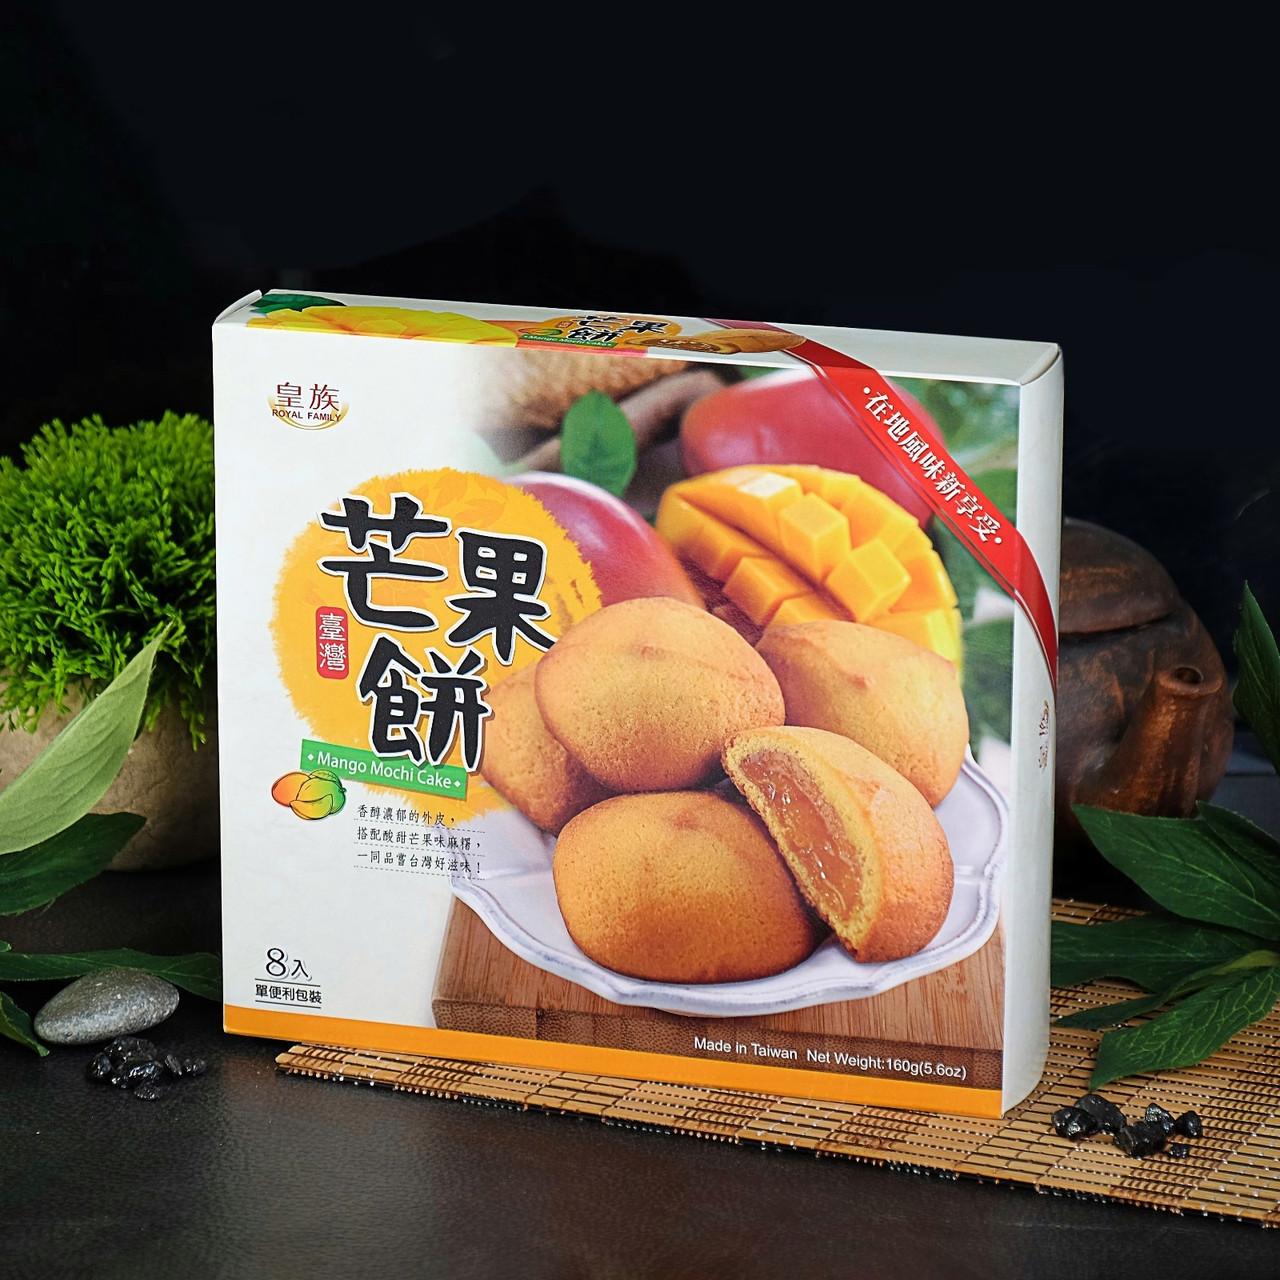 Моти печеньки Роял со вкусом манго